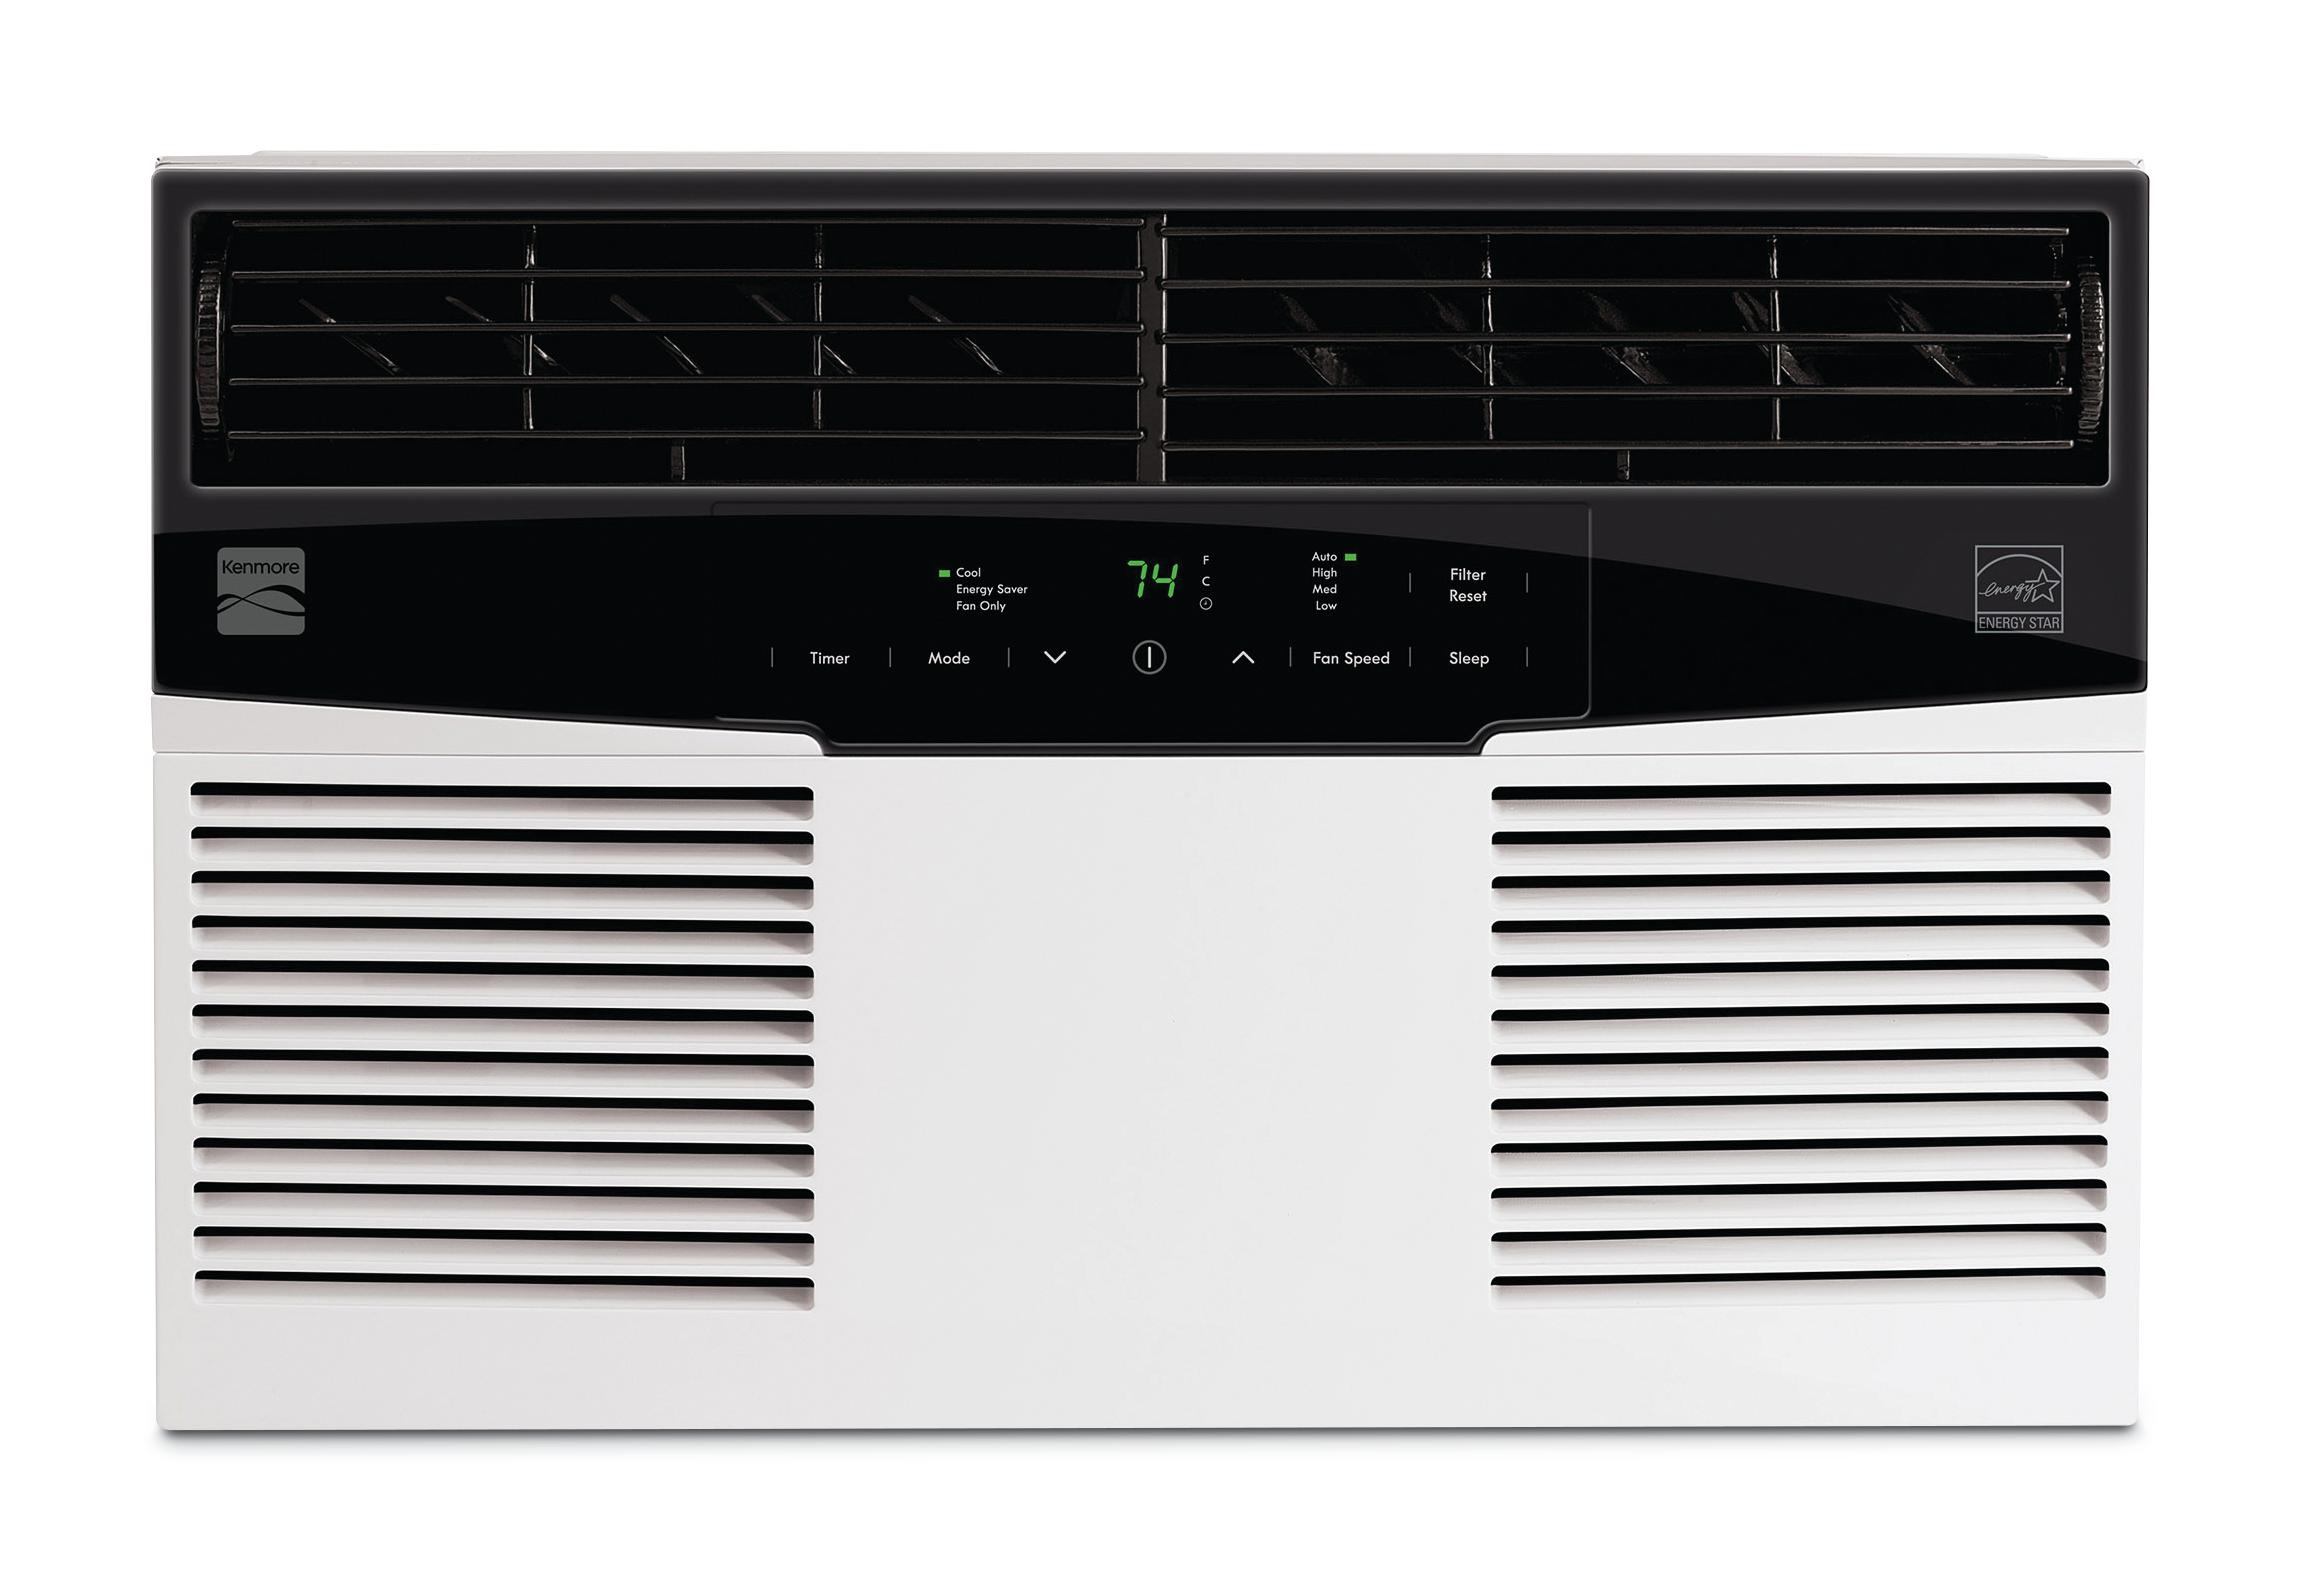 FRIGIDAIRE COMPANY FFRE063ZA1 6,000 BTU 115V Window Air Conditioner - White im test